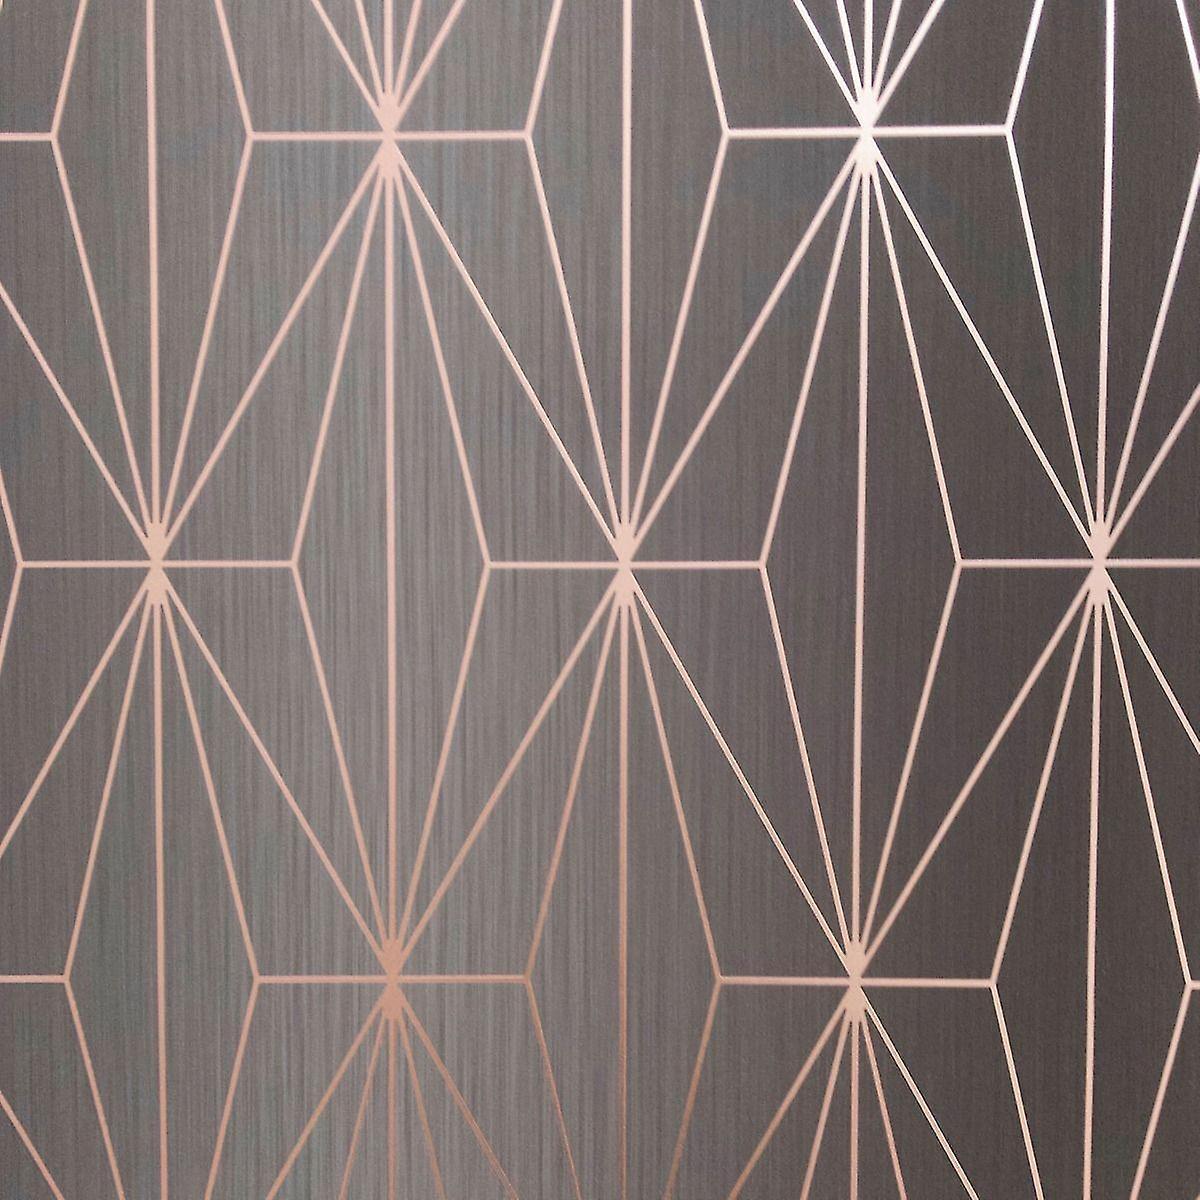 Charcoal Rose Gold Metallic Geometric Wallpaper Triangles Vinyl Muriva Kayla